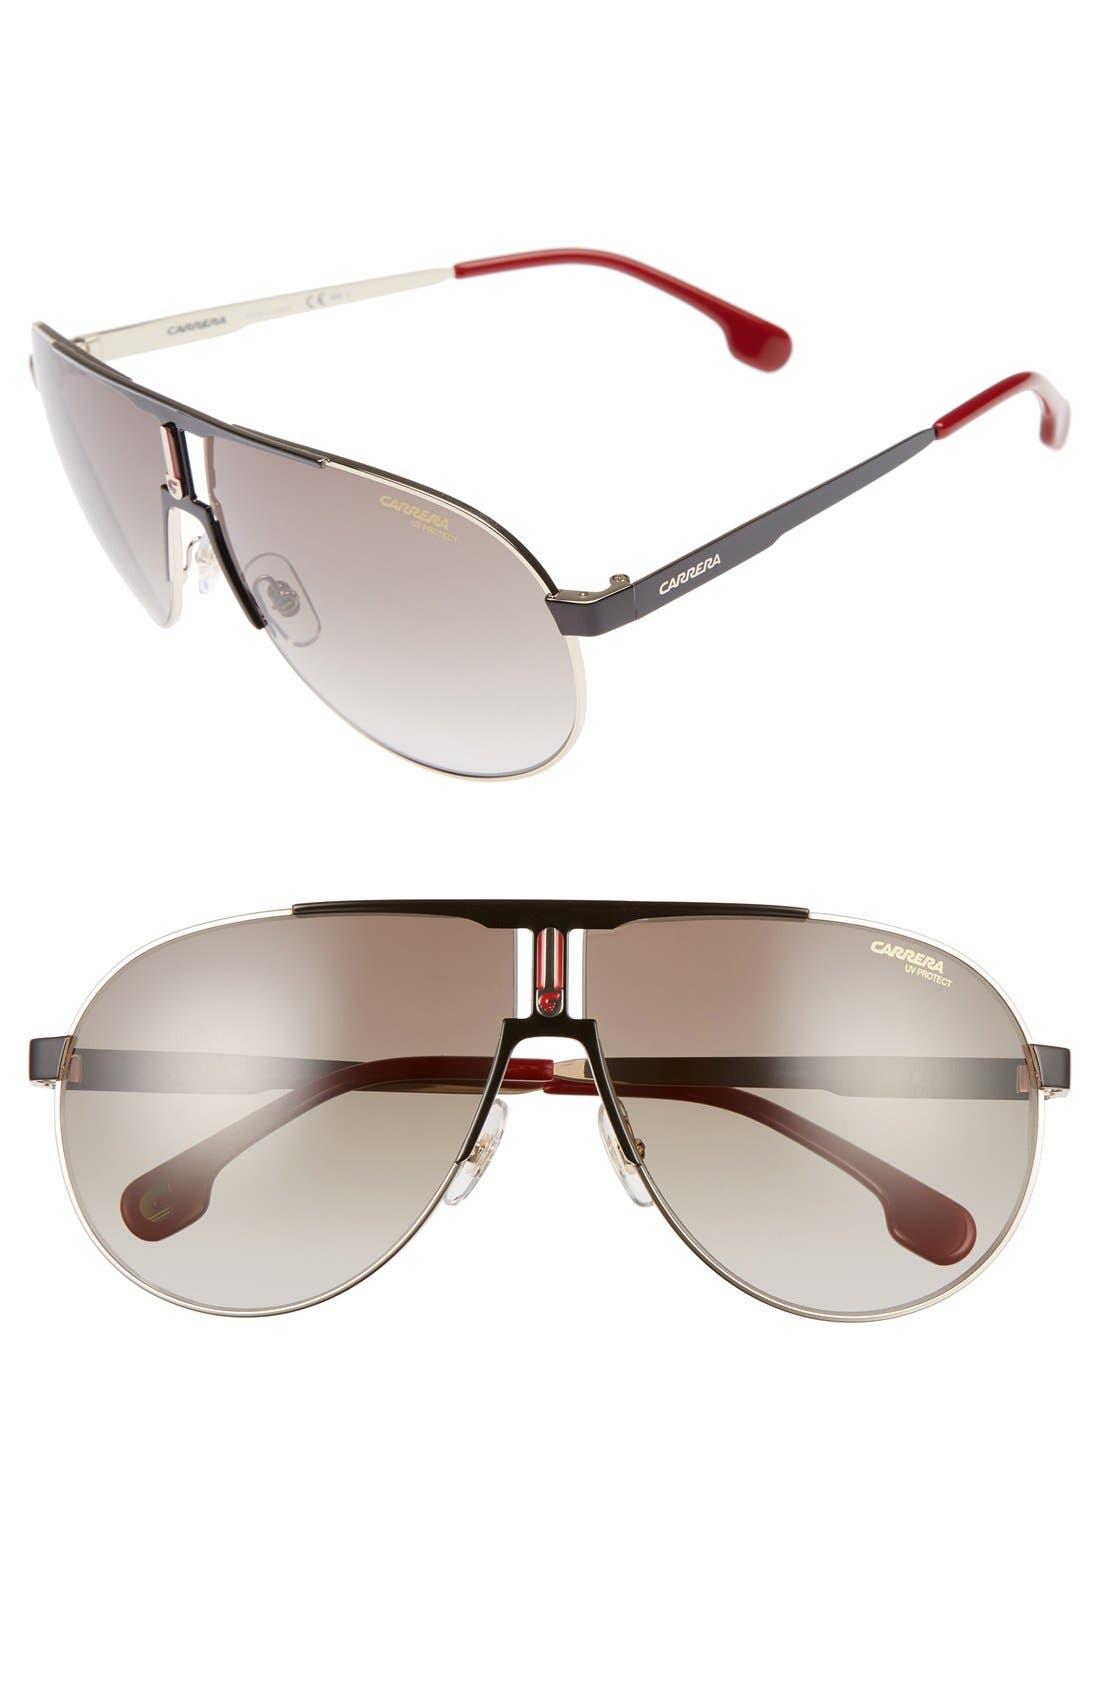 66mm Aviator Sunglasses,                         Main,                         color, Black Gold